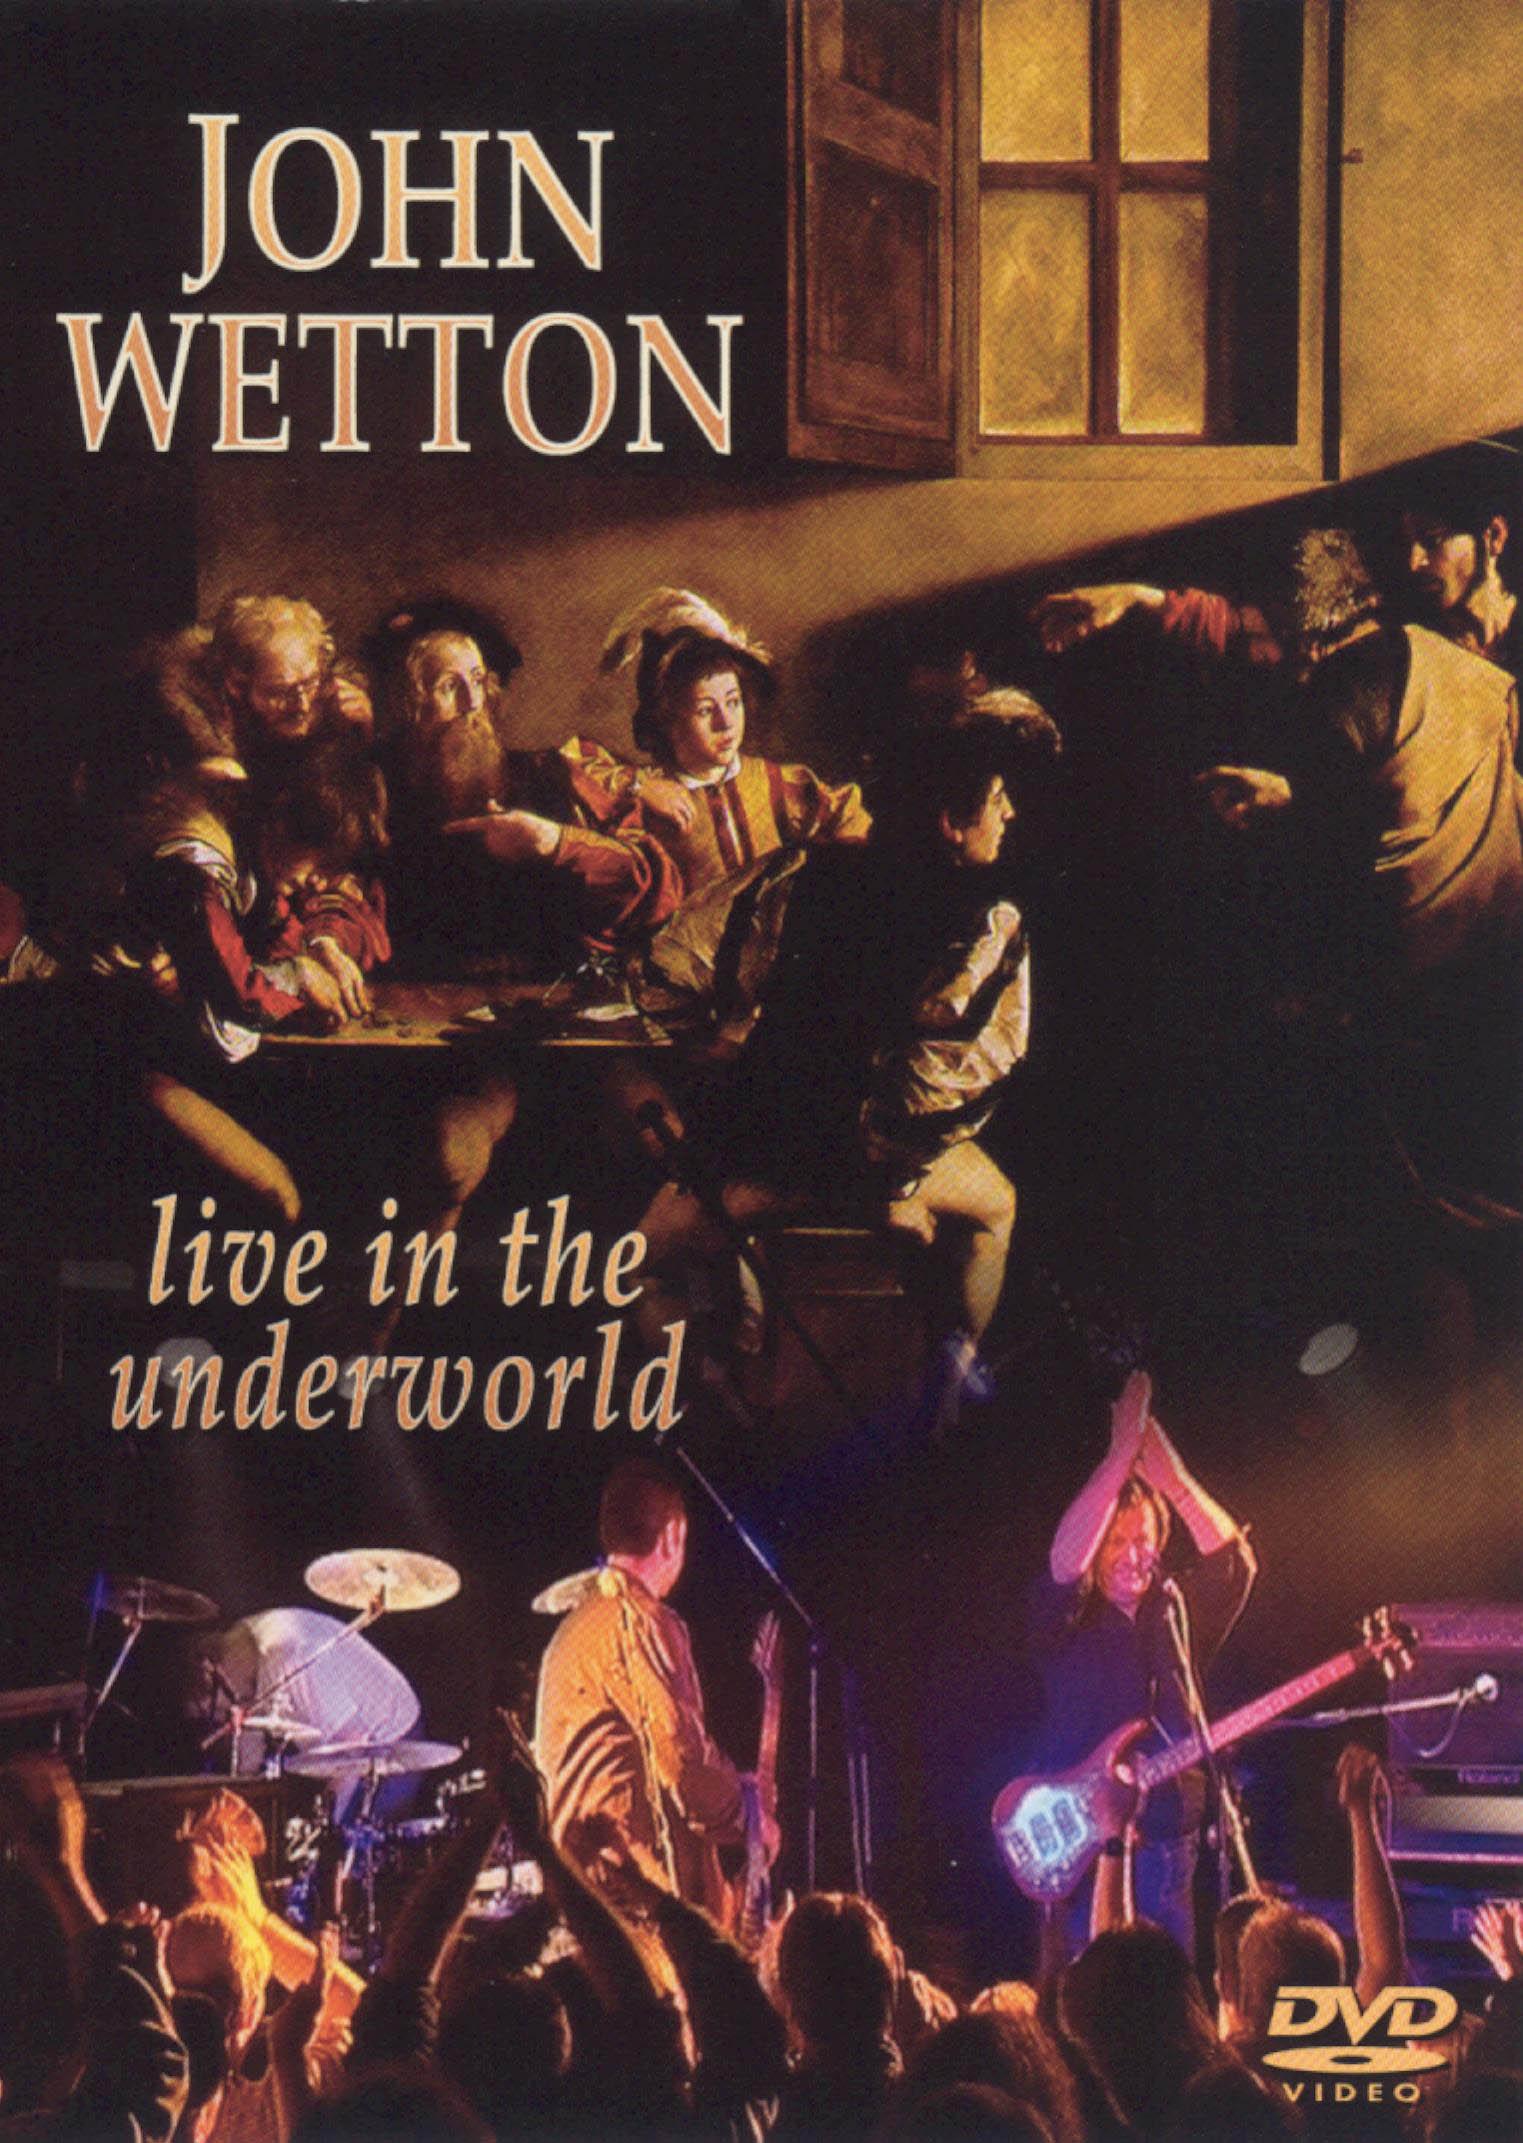 John Wetton: From the Underworld